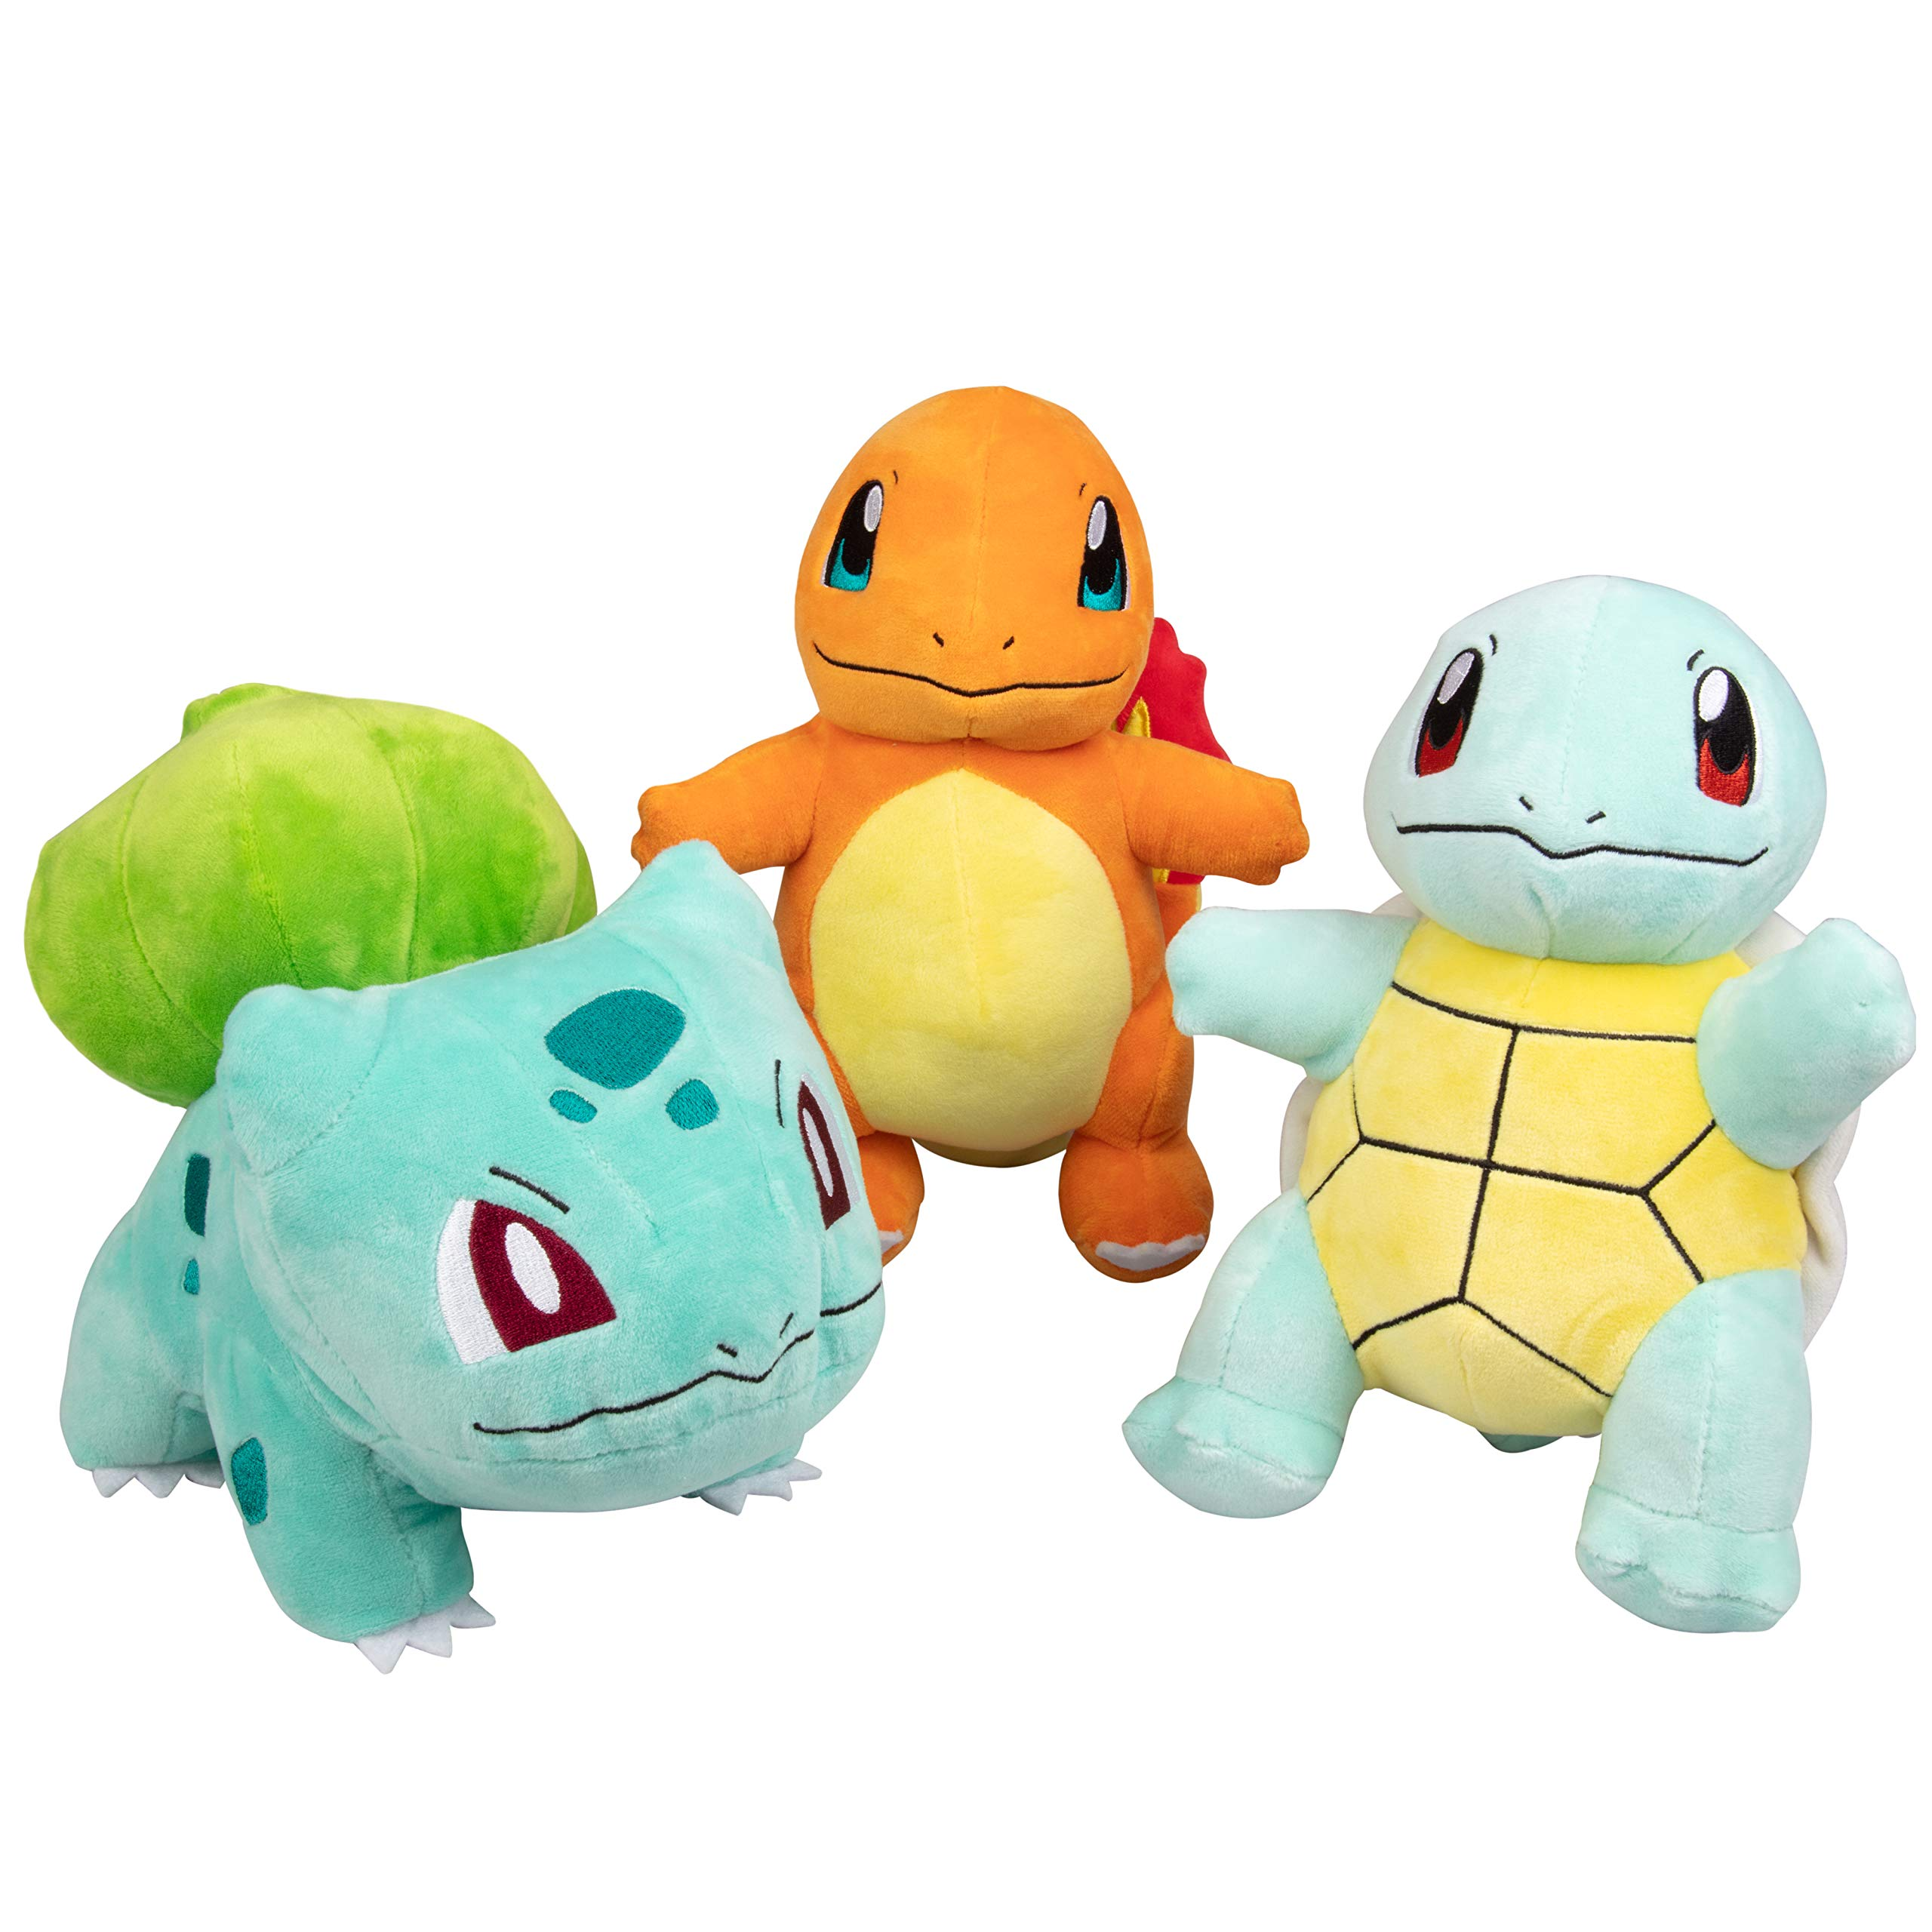 Pokémon Plush Starter 3 Pack - Charmander, Squirtle & Bulbasaur 8'' Generation One Stuffed Animals